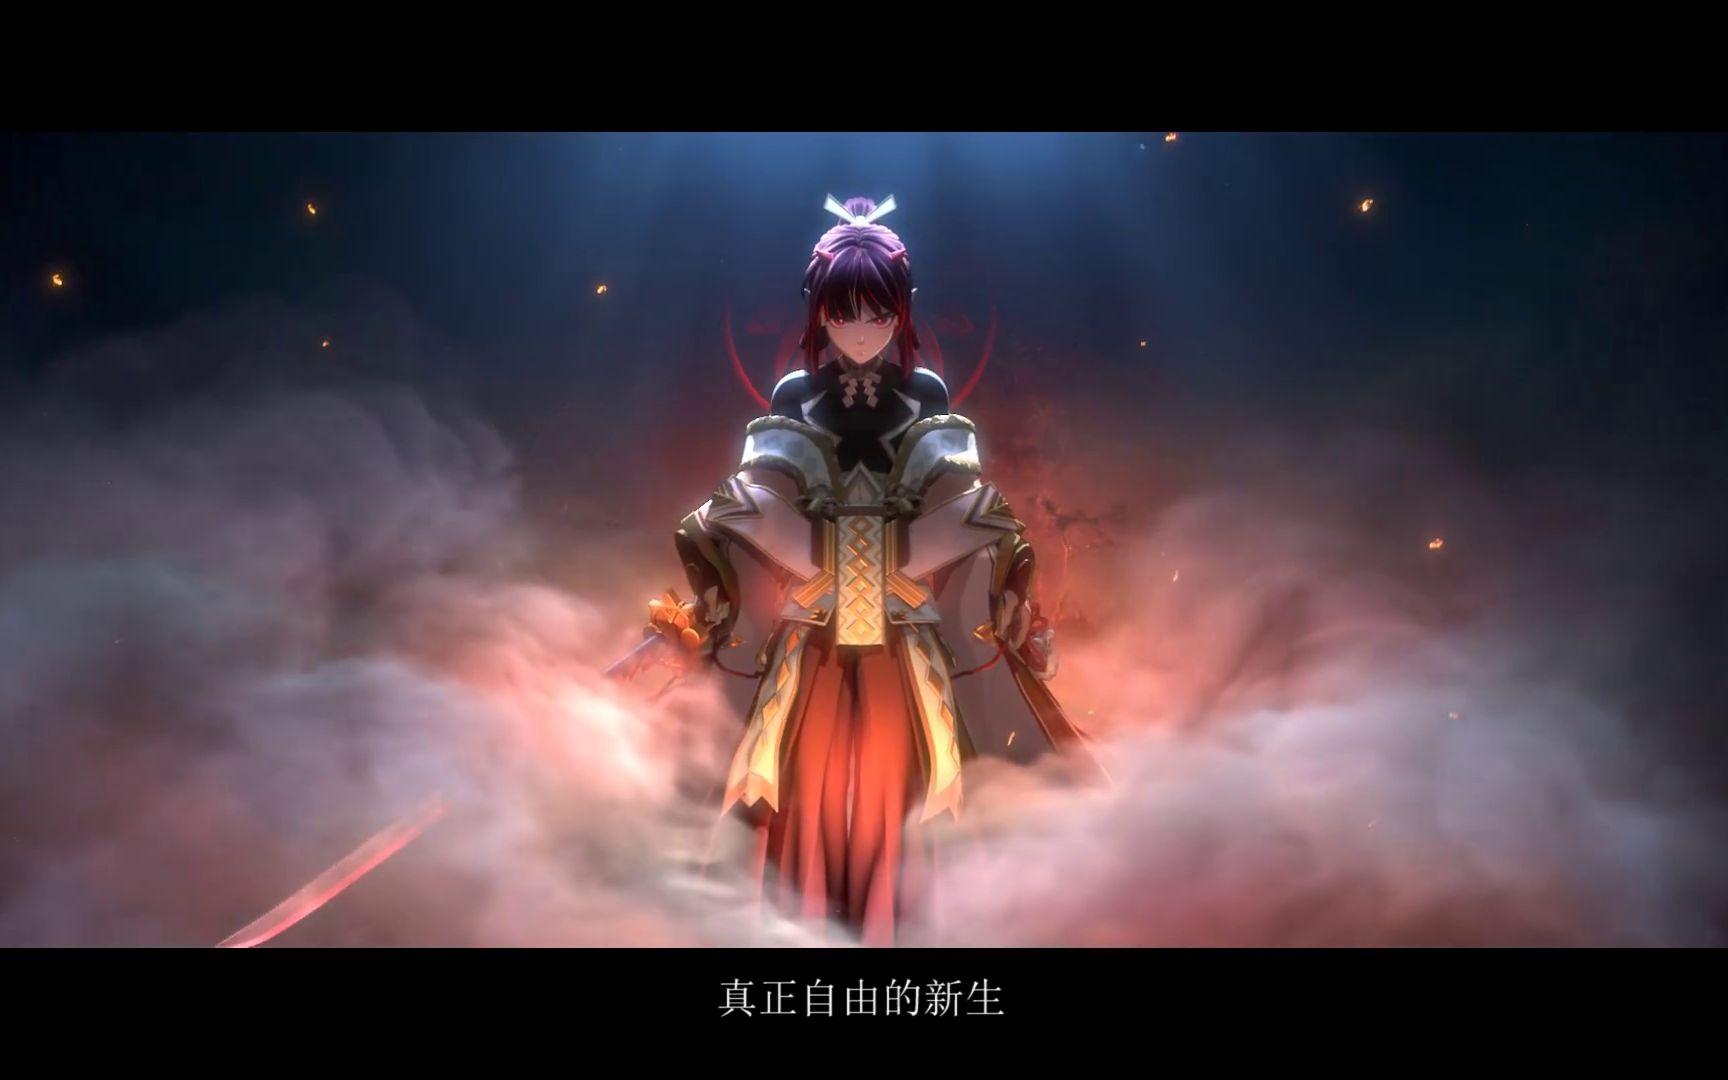 SP鬼切CG预览 NGA阴阳师